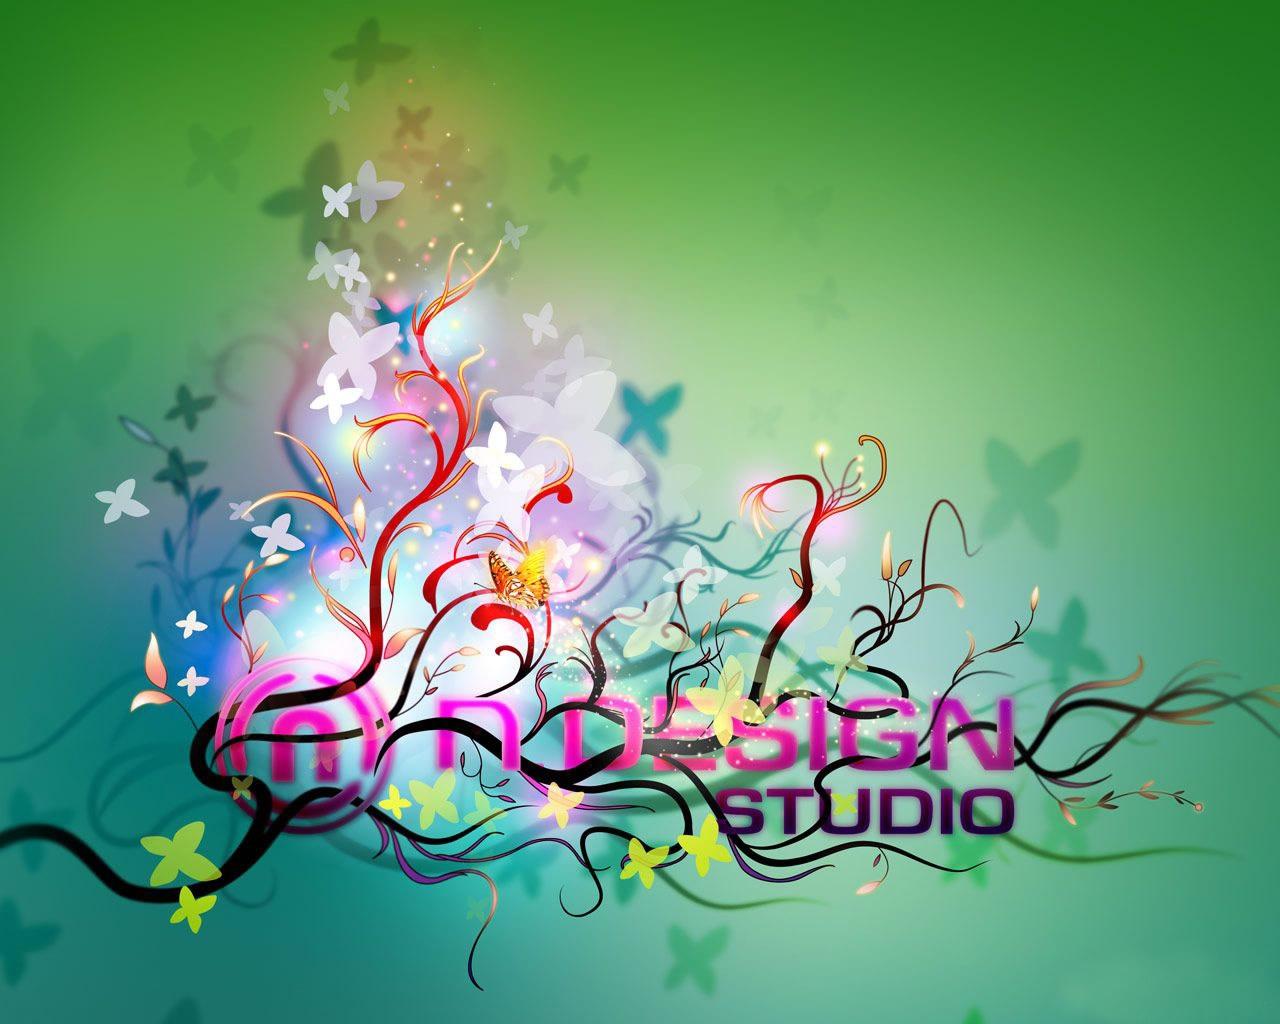 Design Studio Wallpaper